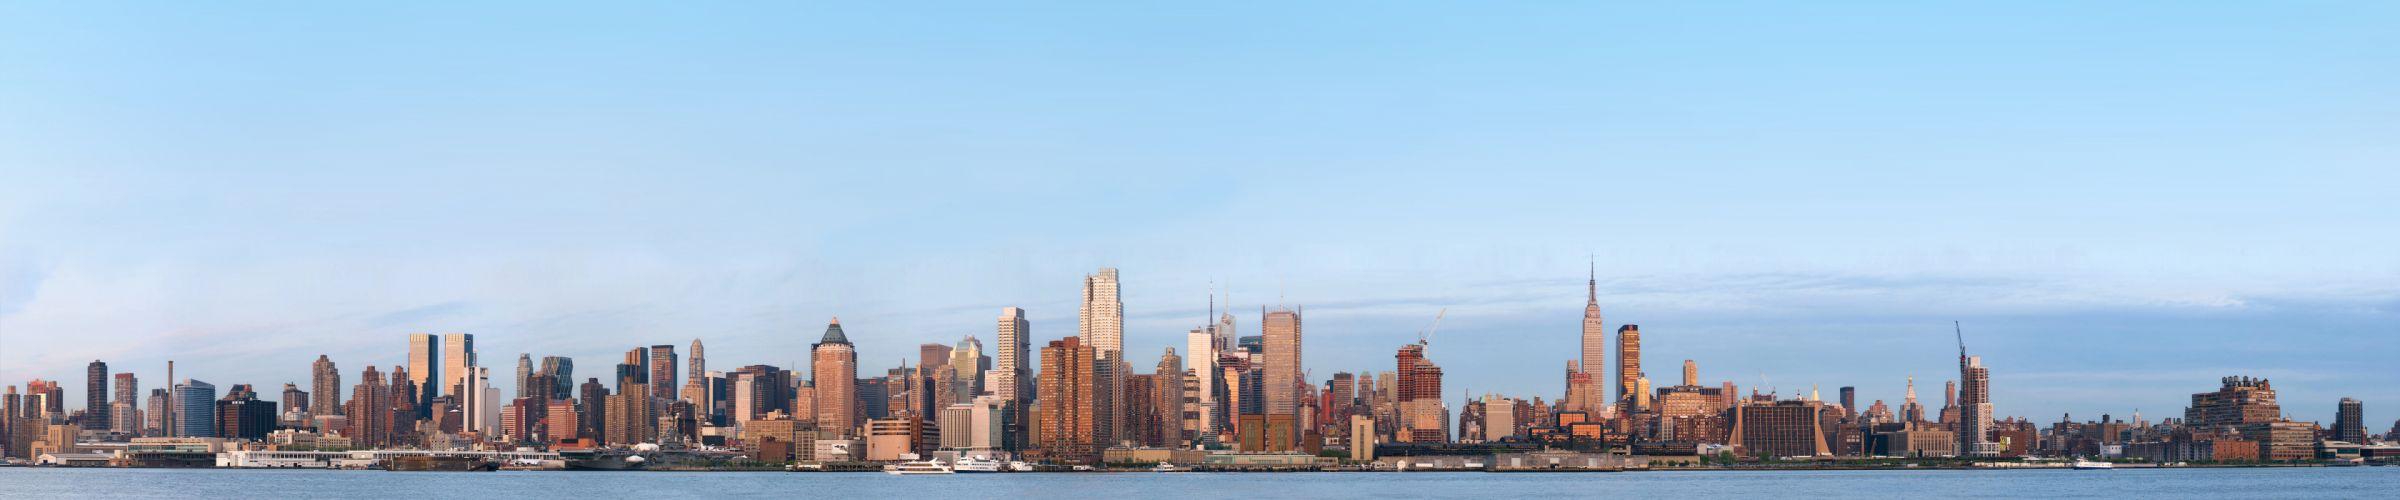 New York City j wallpaper